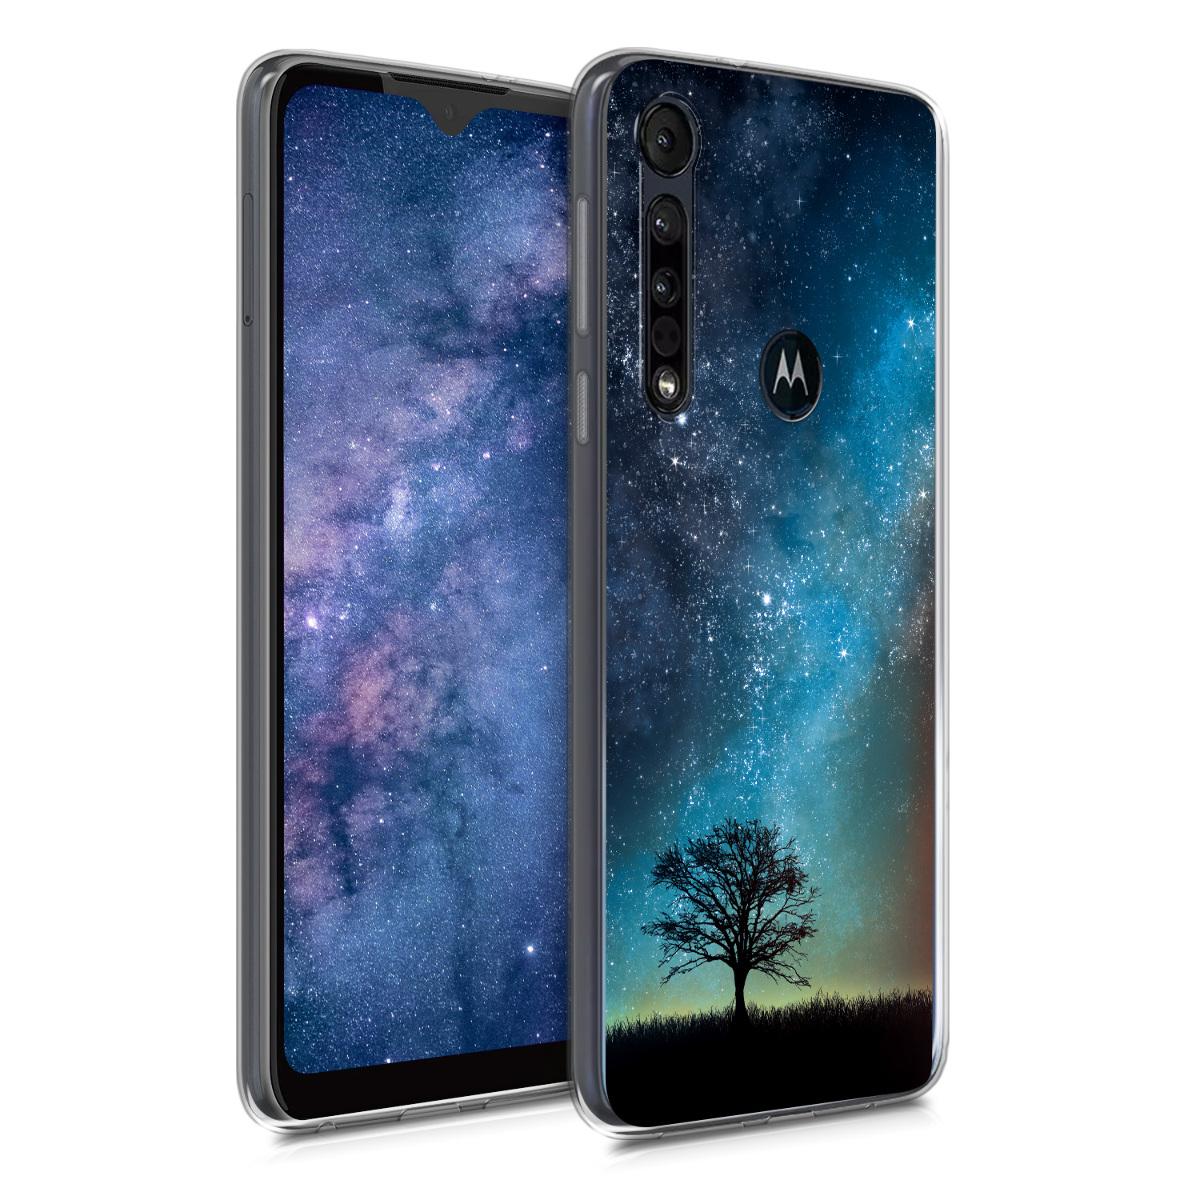 KW Θήκη Σιλικόνης Motorola One Macro - Cosmic Nature - Blue / Grey / Black (50794.01)